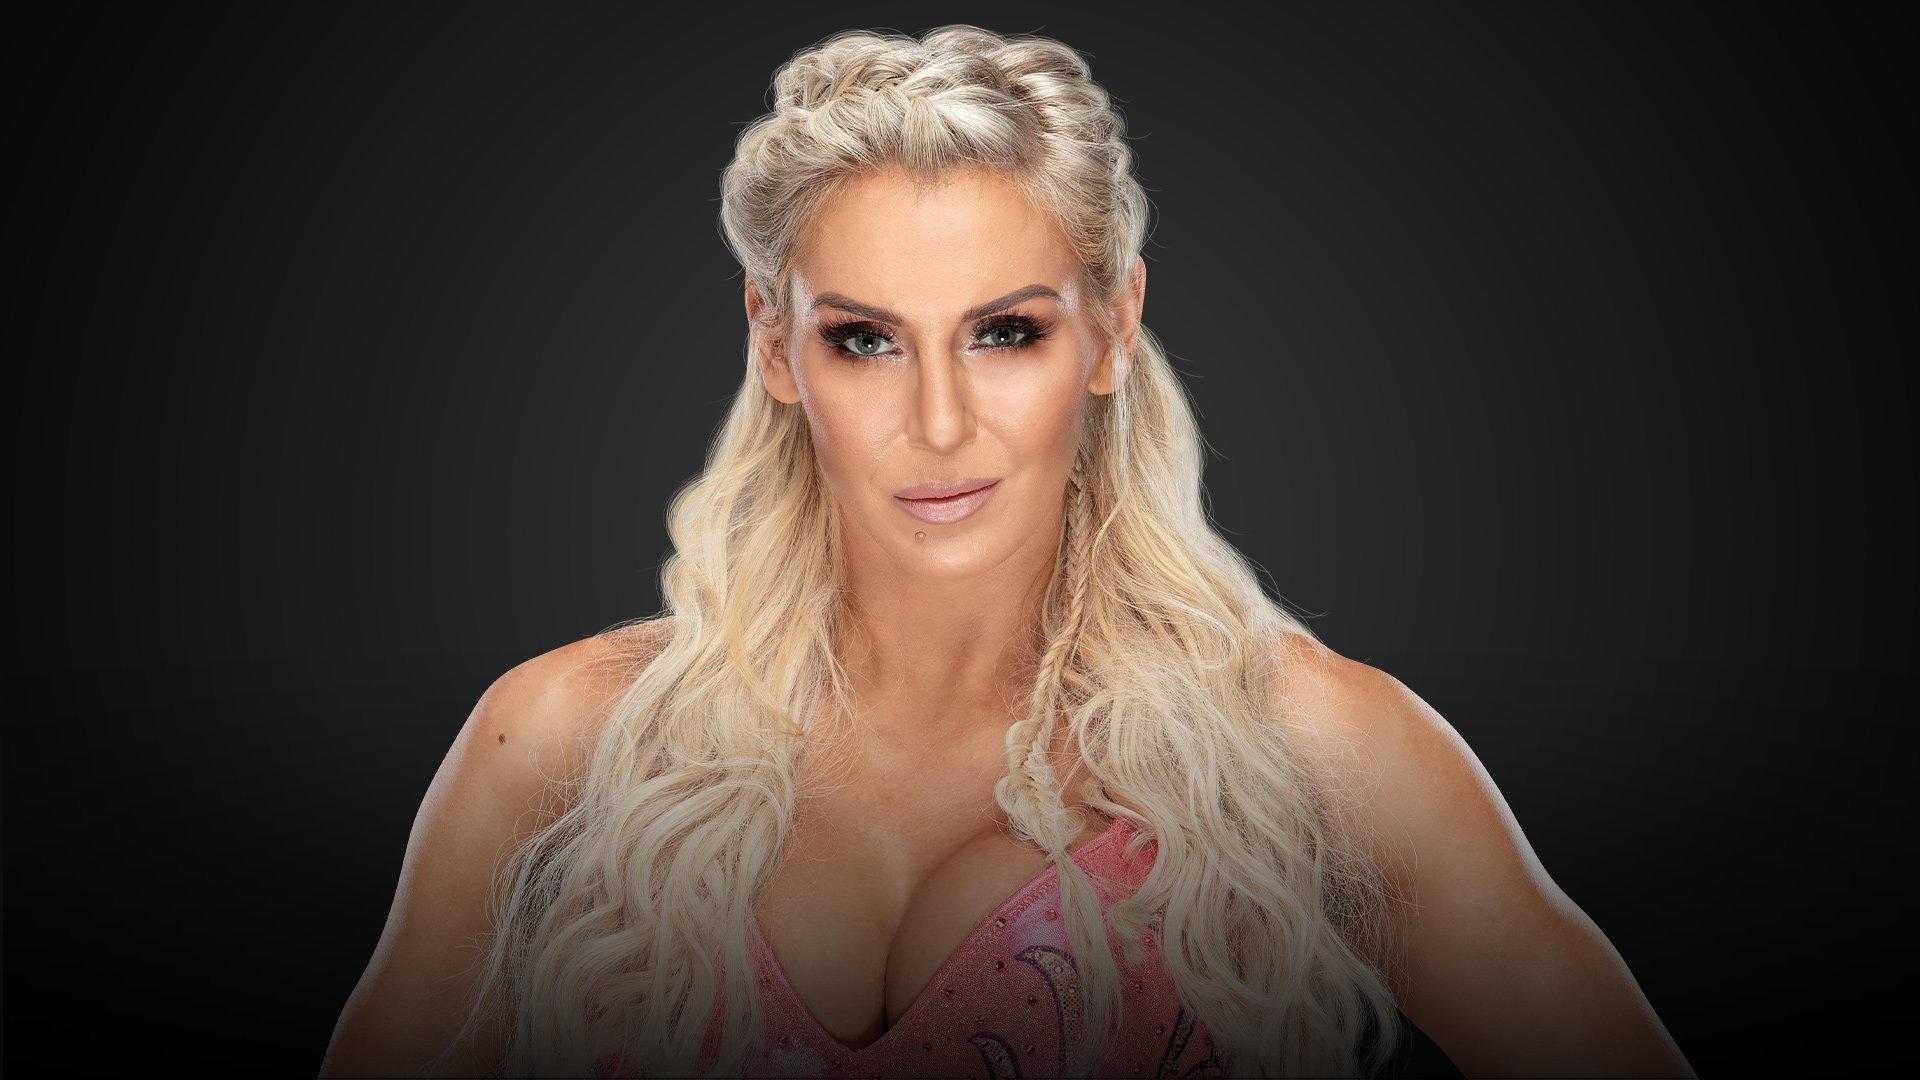 Women's Royal Rumble Match 2020